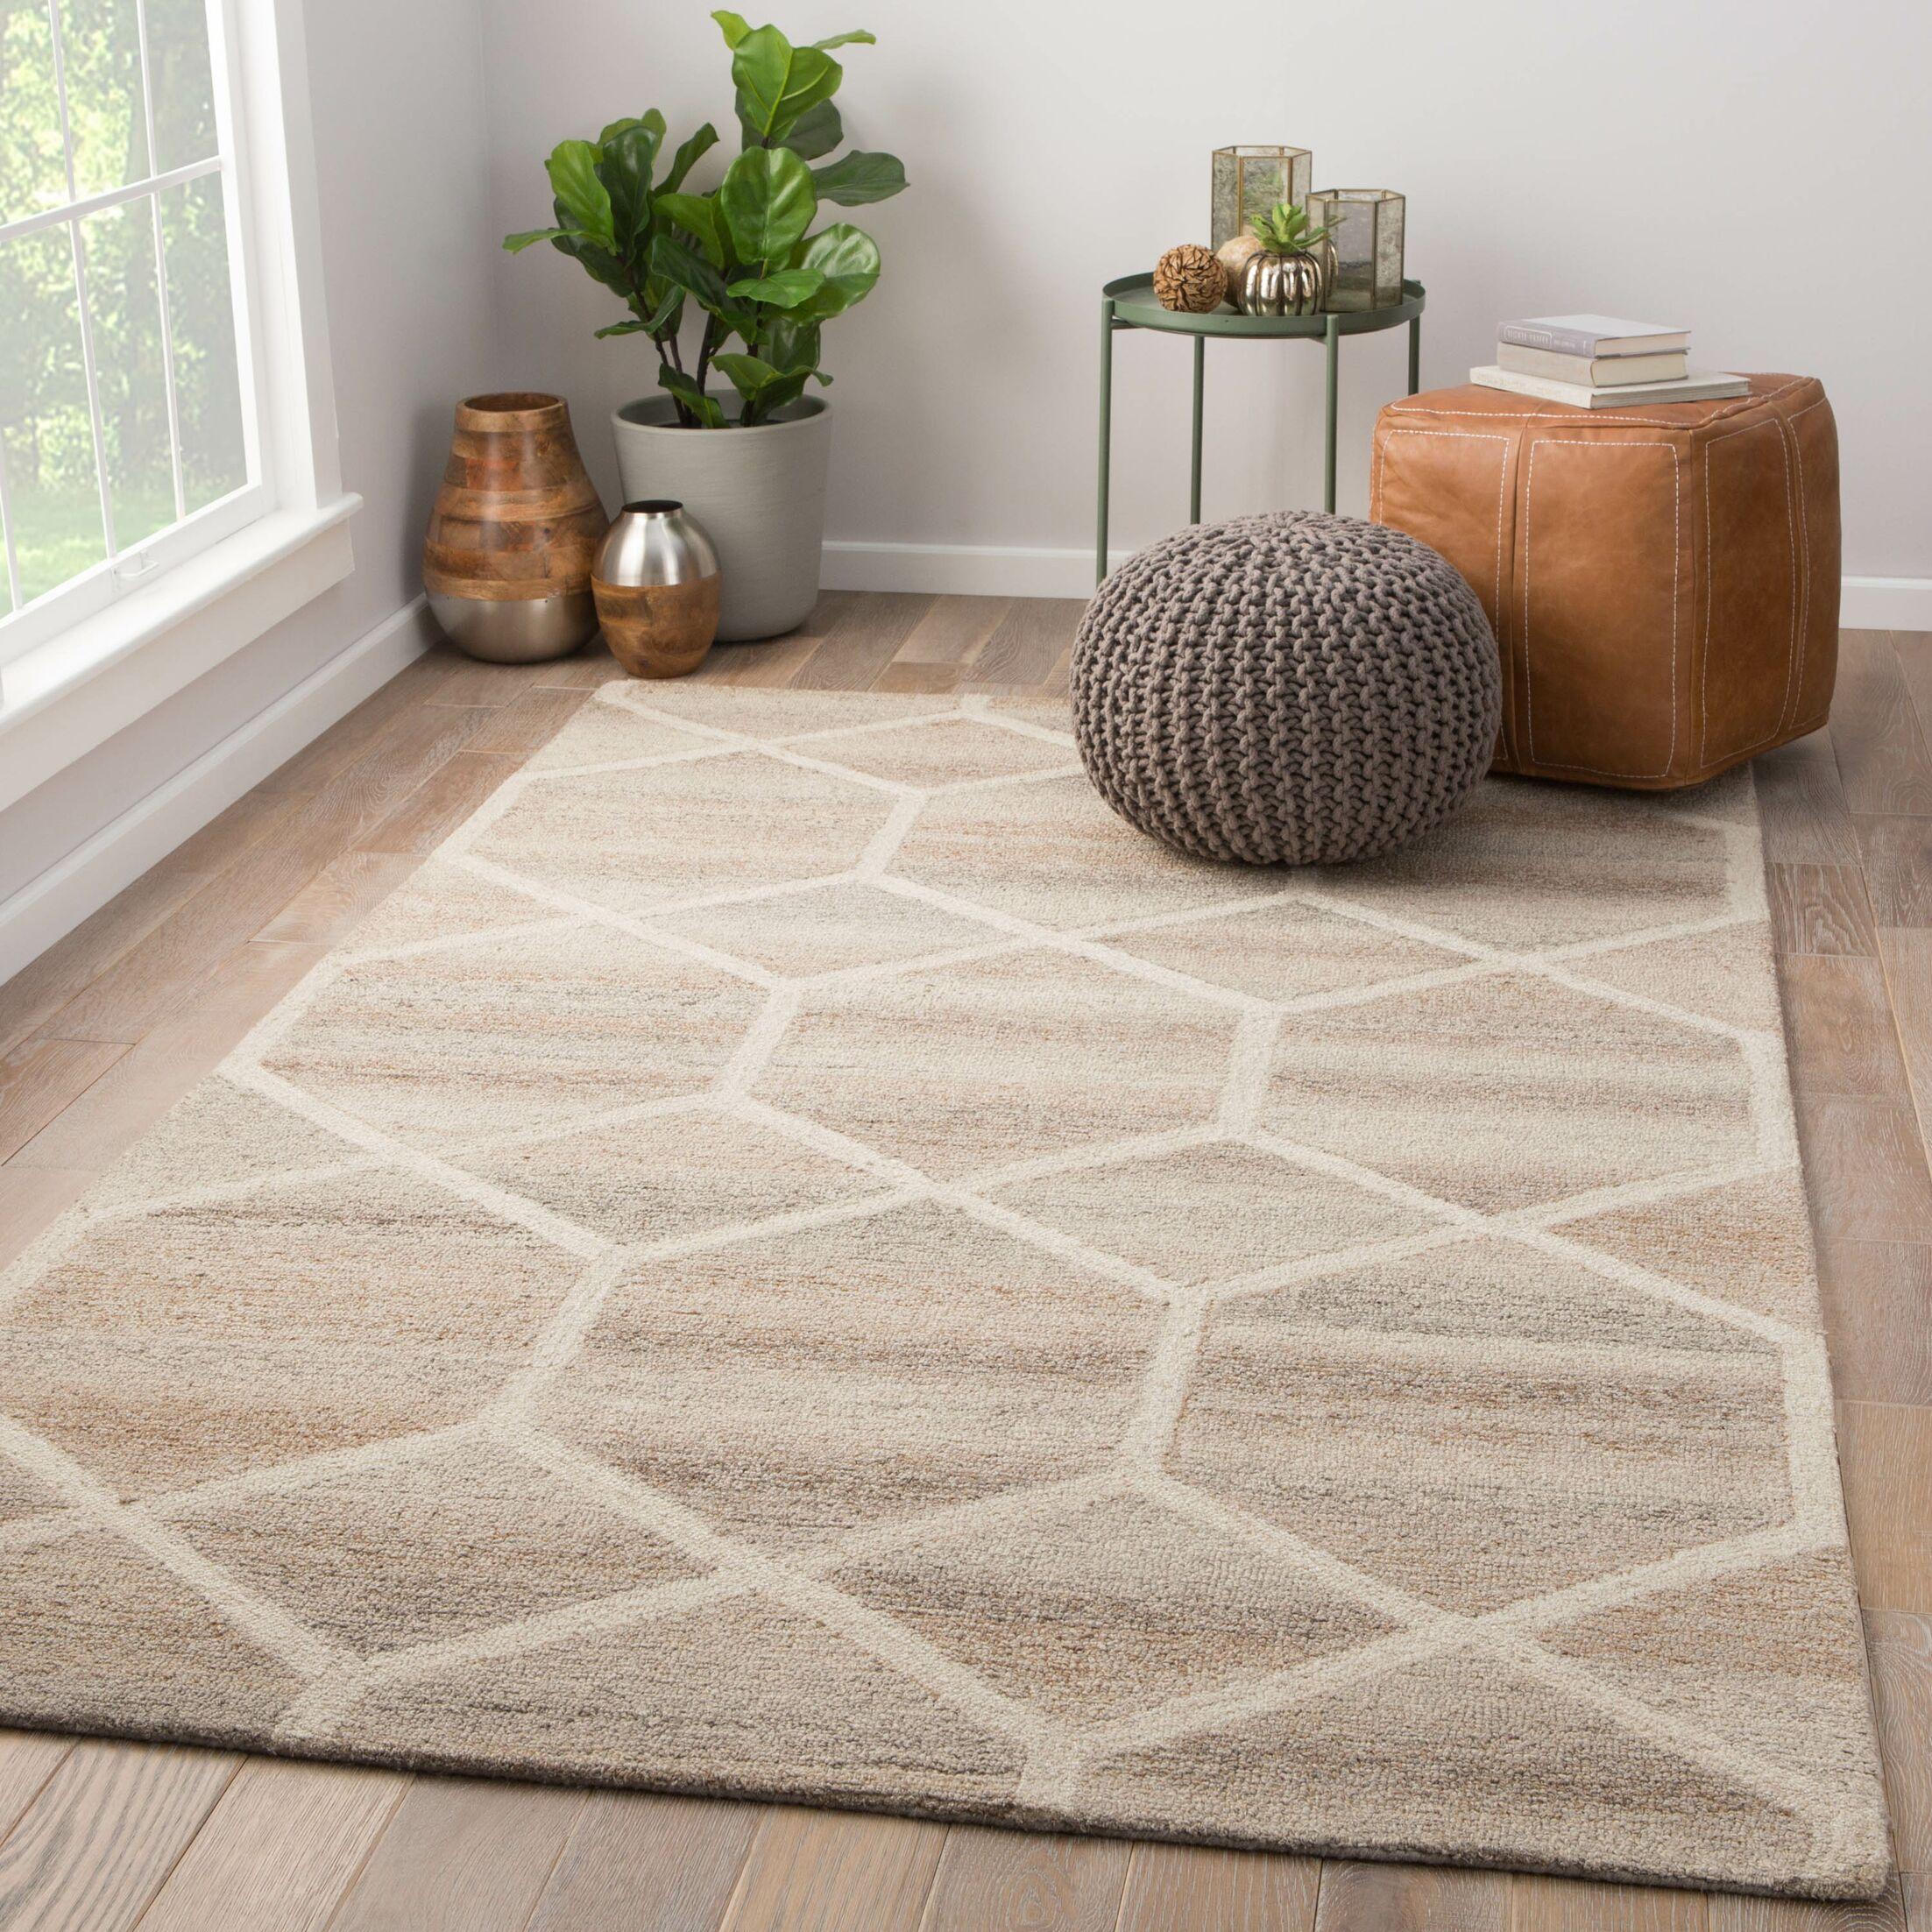 Tulsa Hand Tufted Wool Beige Area Rug Rug Size: Rectangle 9' x 13'